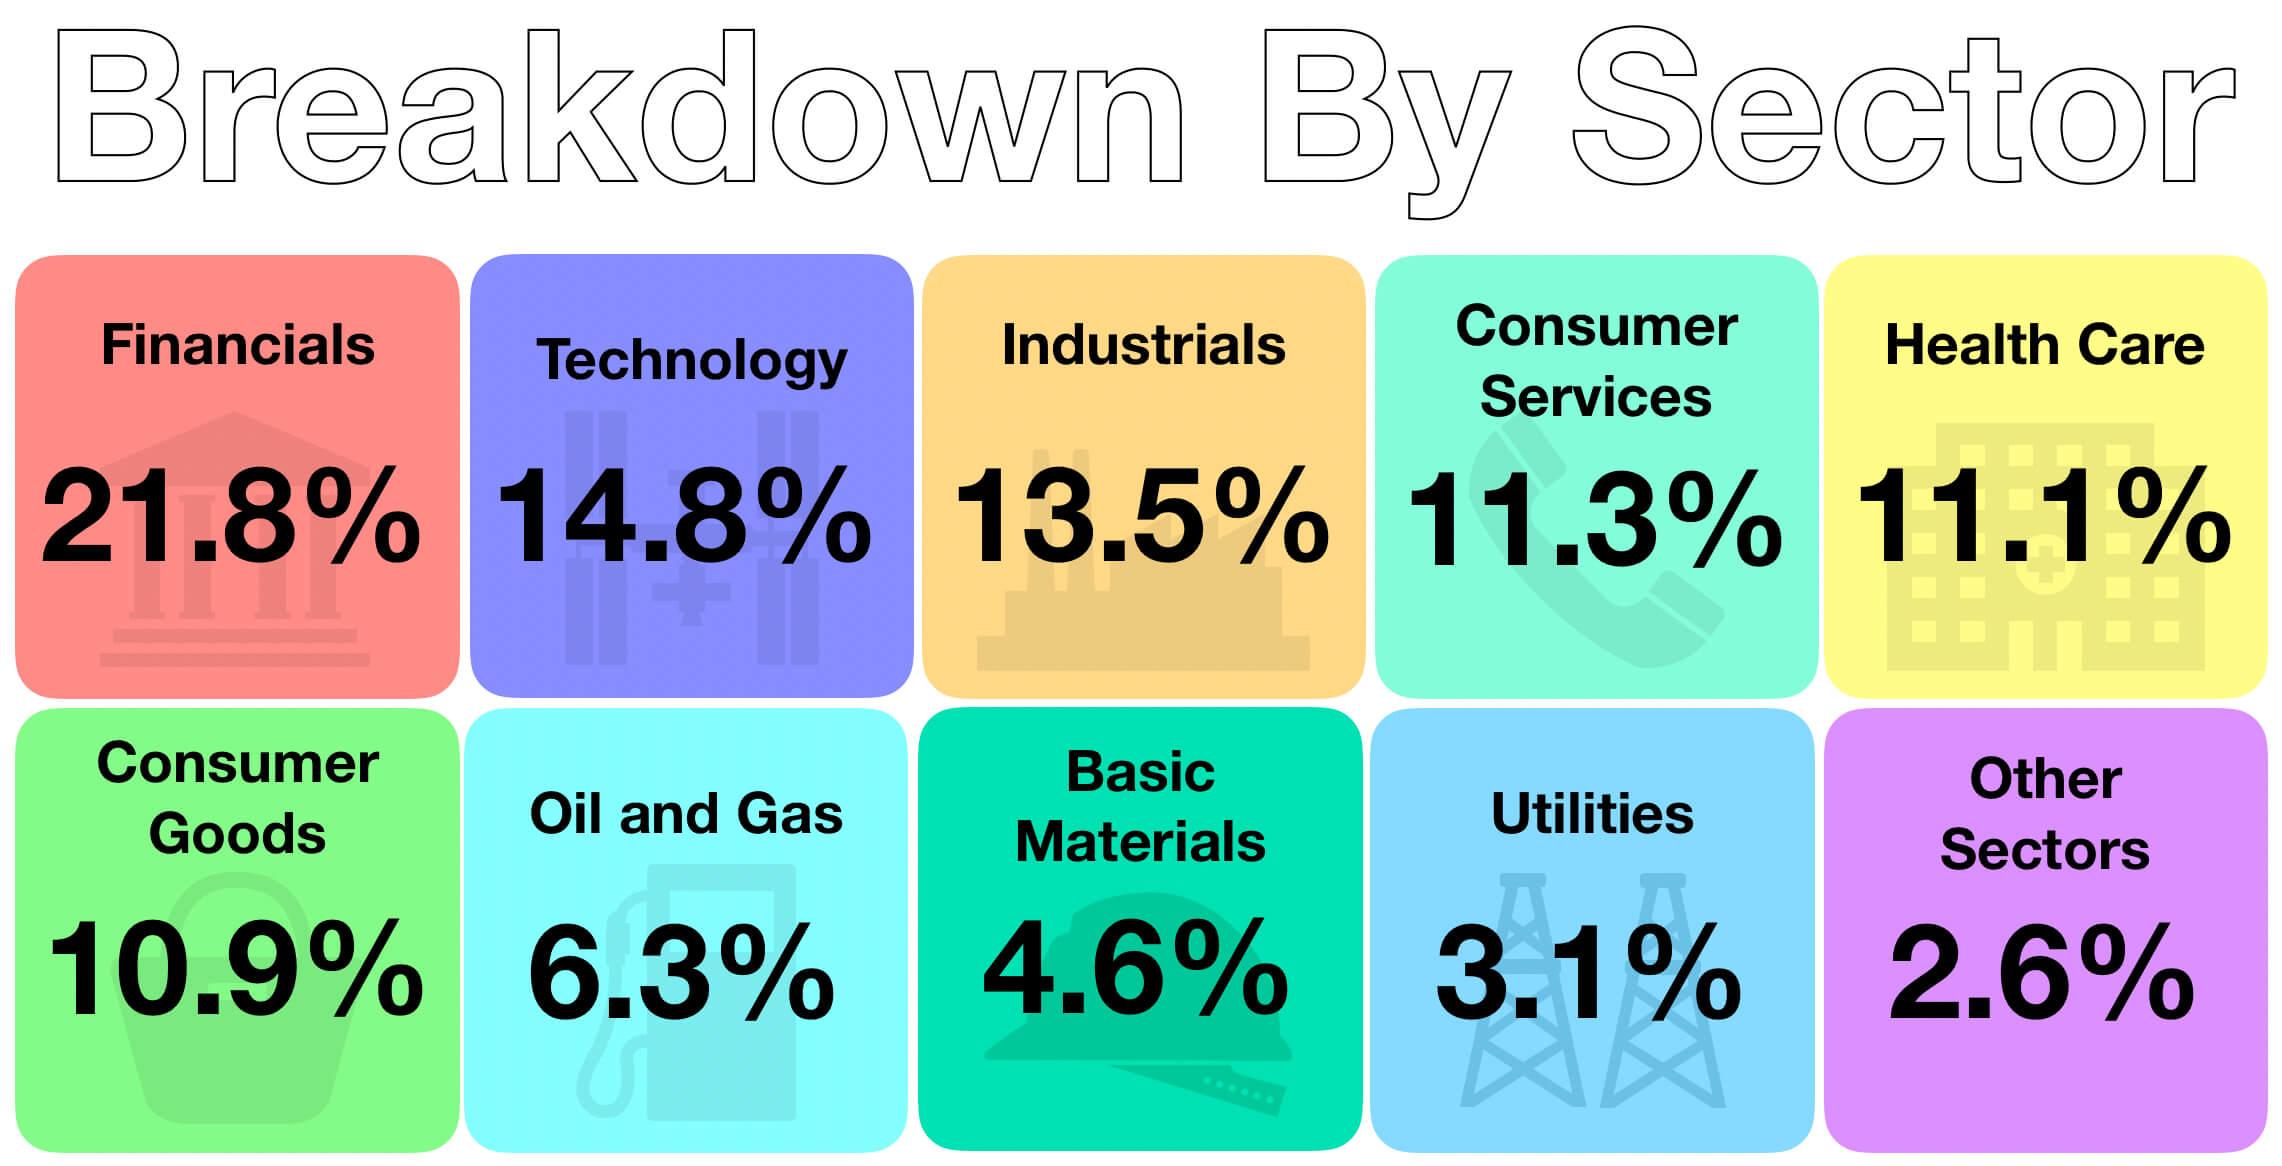 November 2018 Sector Breakdown of Passive Investments